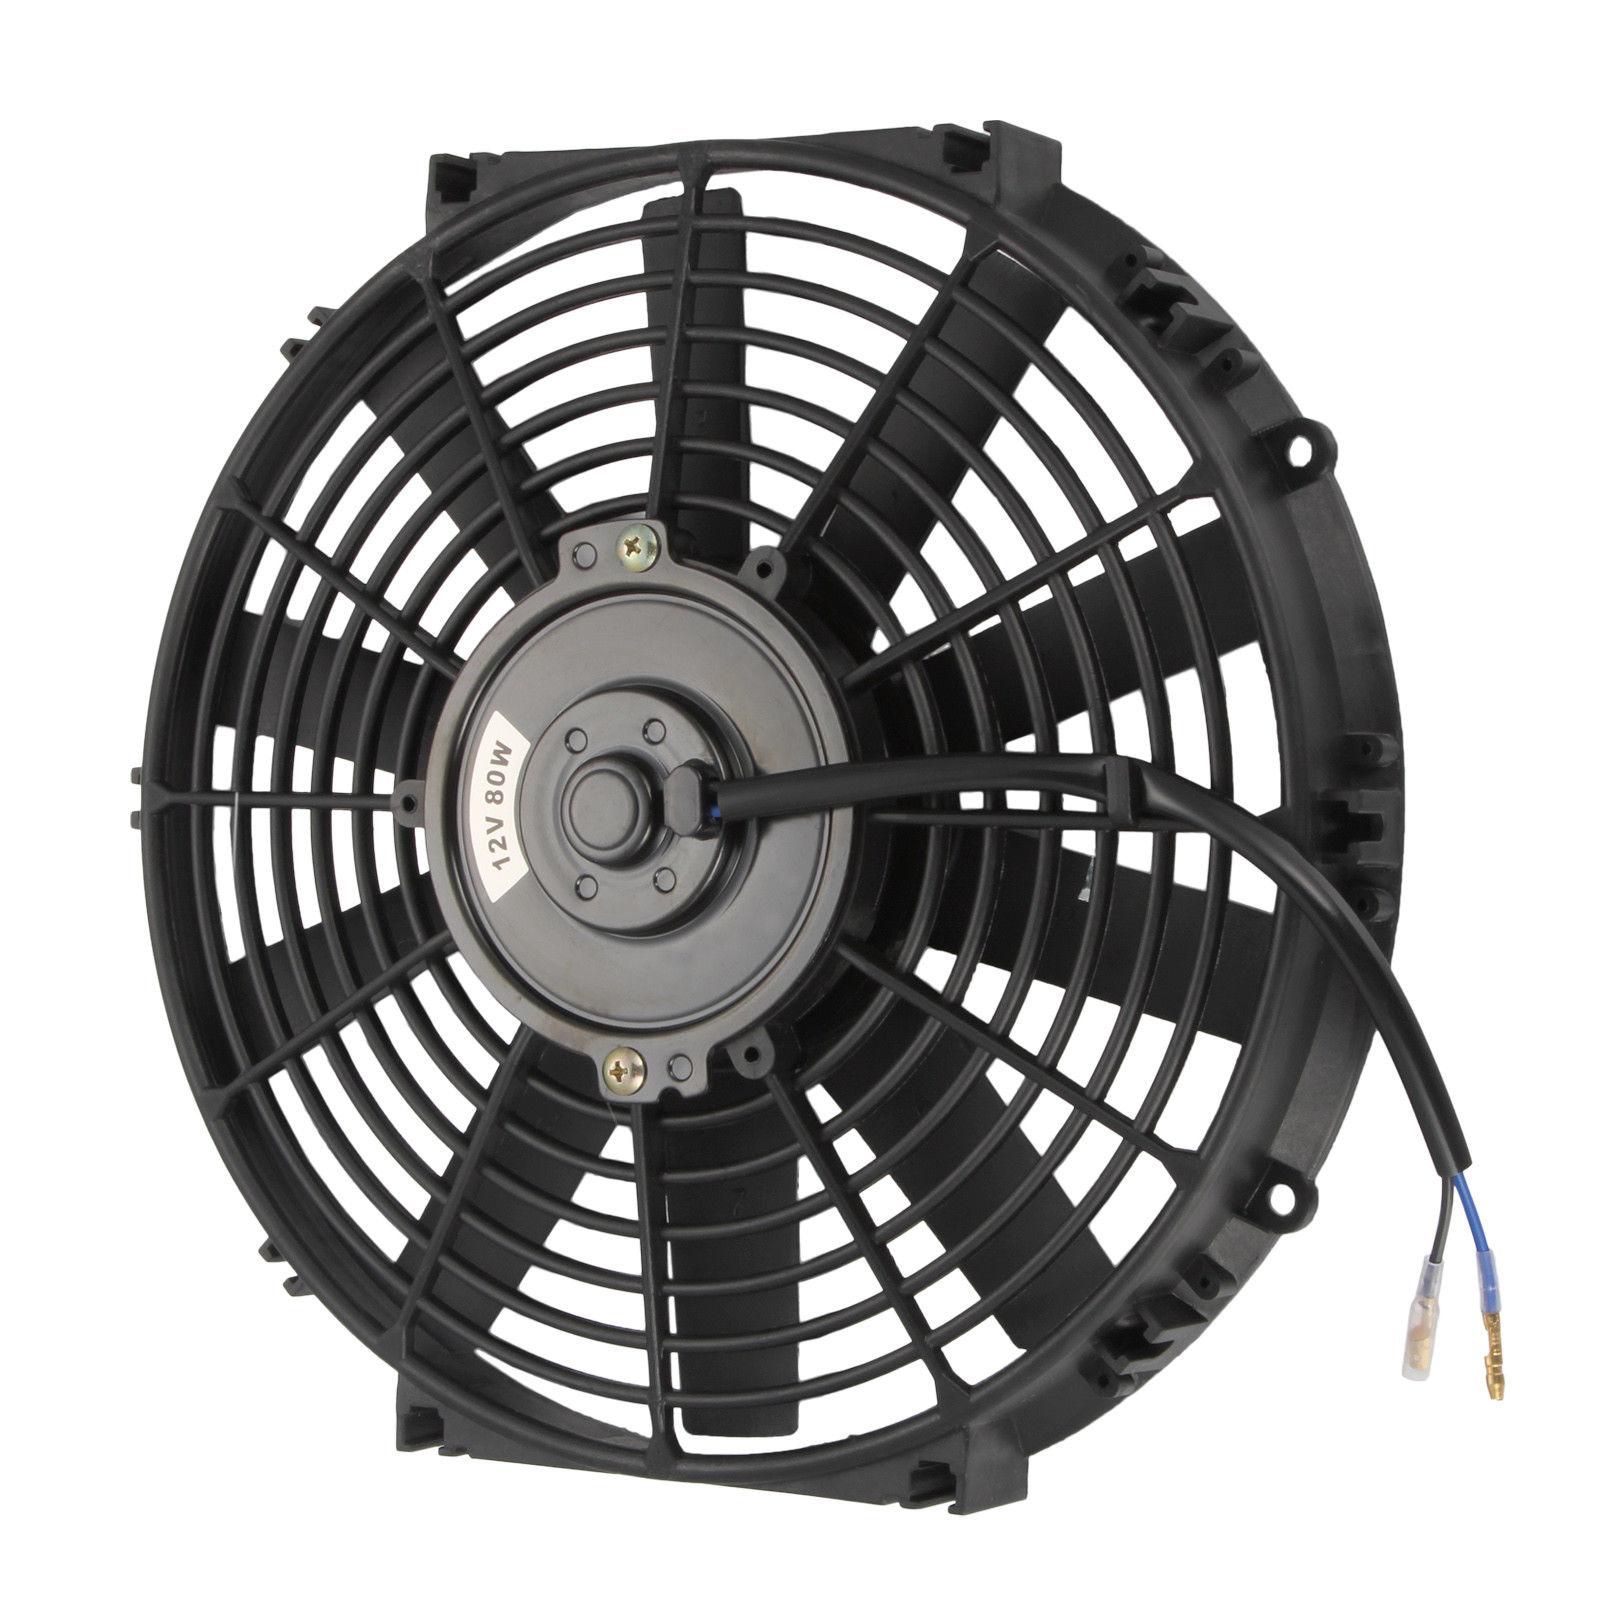 1600x1600 Universal 12 Inch Radiator Fan Cooling Thermo Electric Fan W